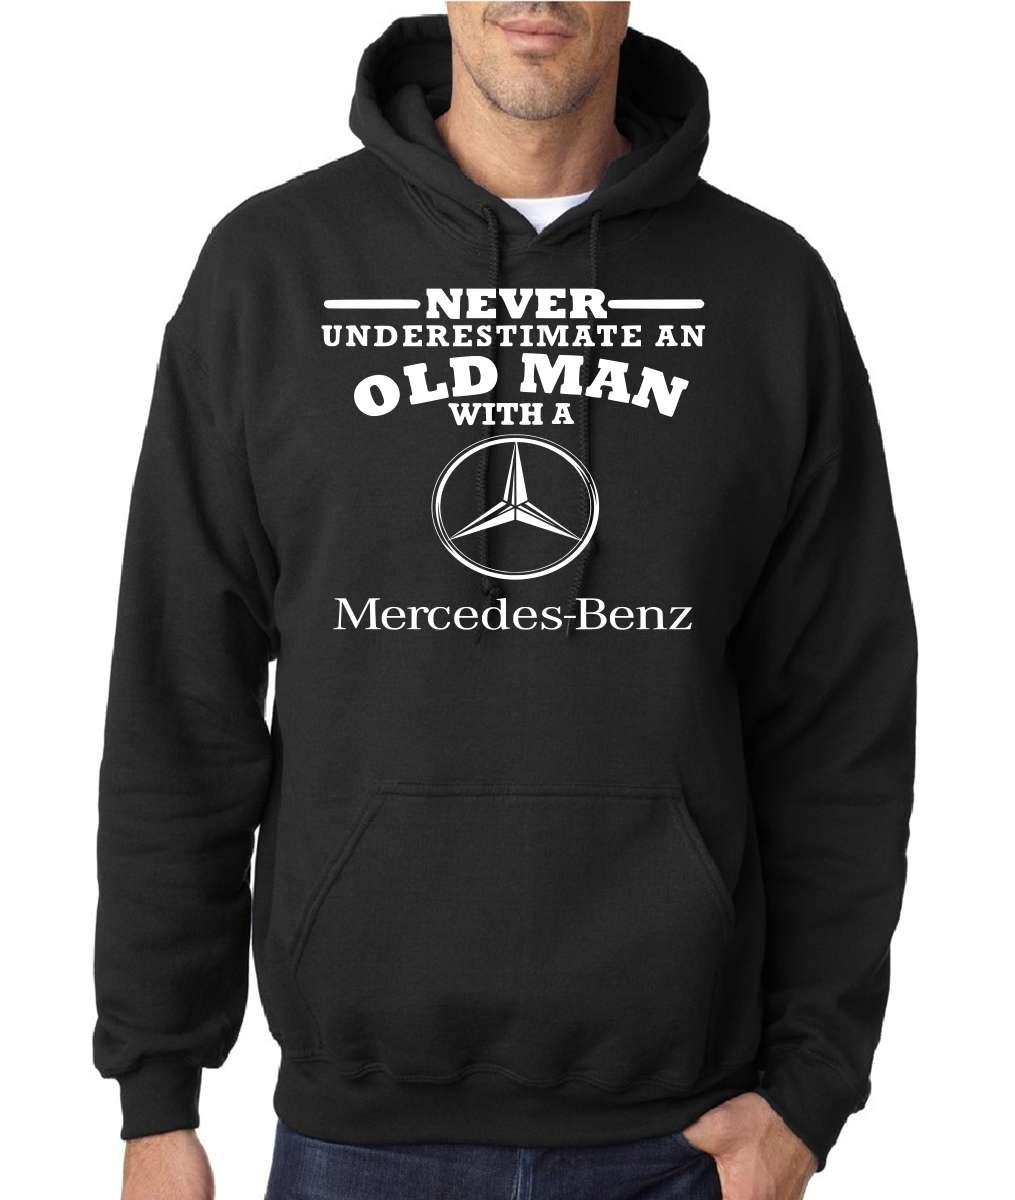 mercedes benz never underestimate an old man mens hoodies. Black Bedroom Furniture Sets. Home Design Ideas